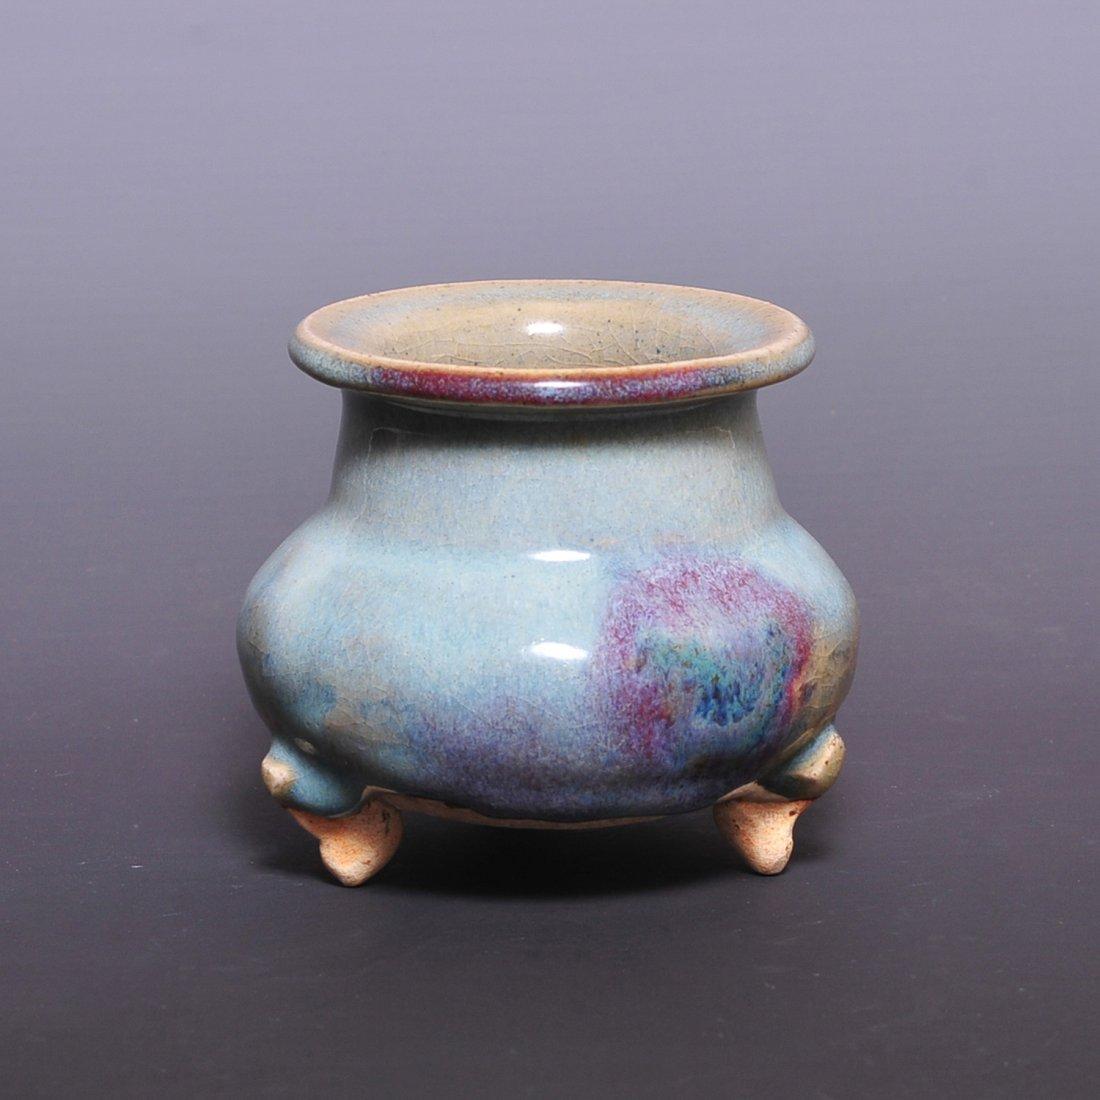 Chinese Yuan Dynasty Jun porcelain hanging red furnace